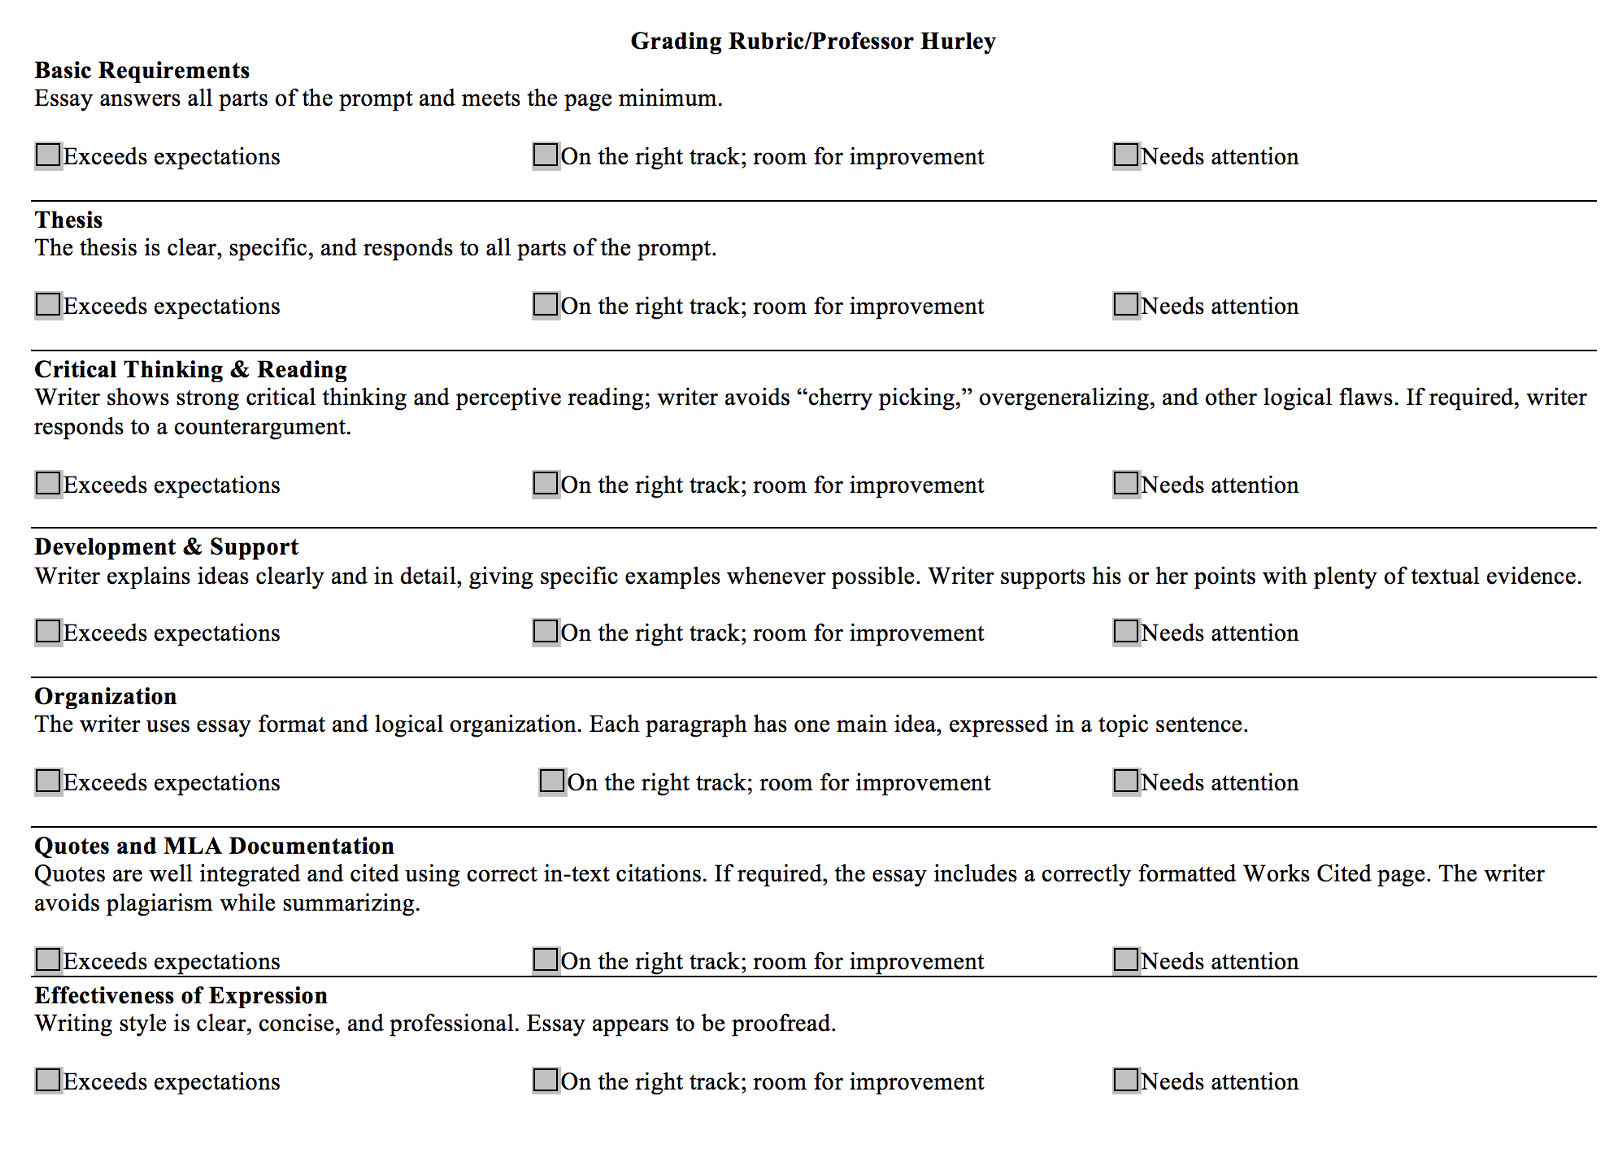 004 Essay Professor 1l7bkjqmu2kth Pcoqy7bgg Amazing Teaching College Writing On My In French Full